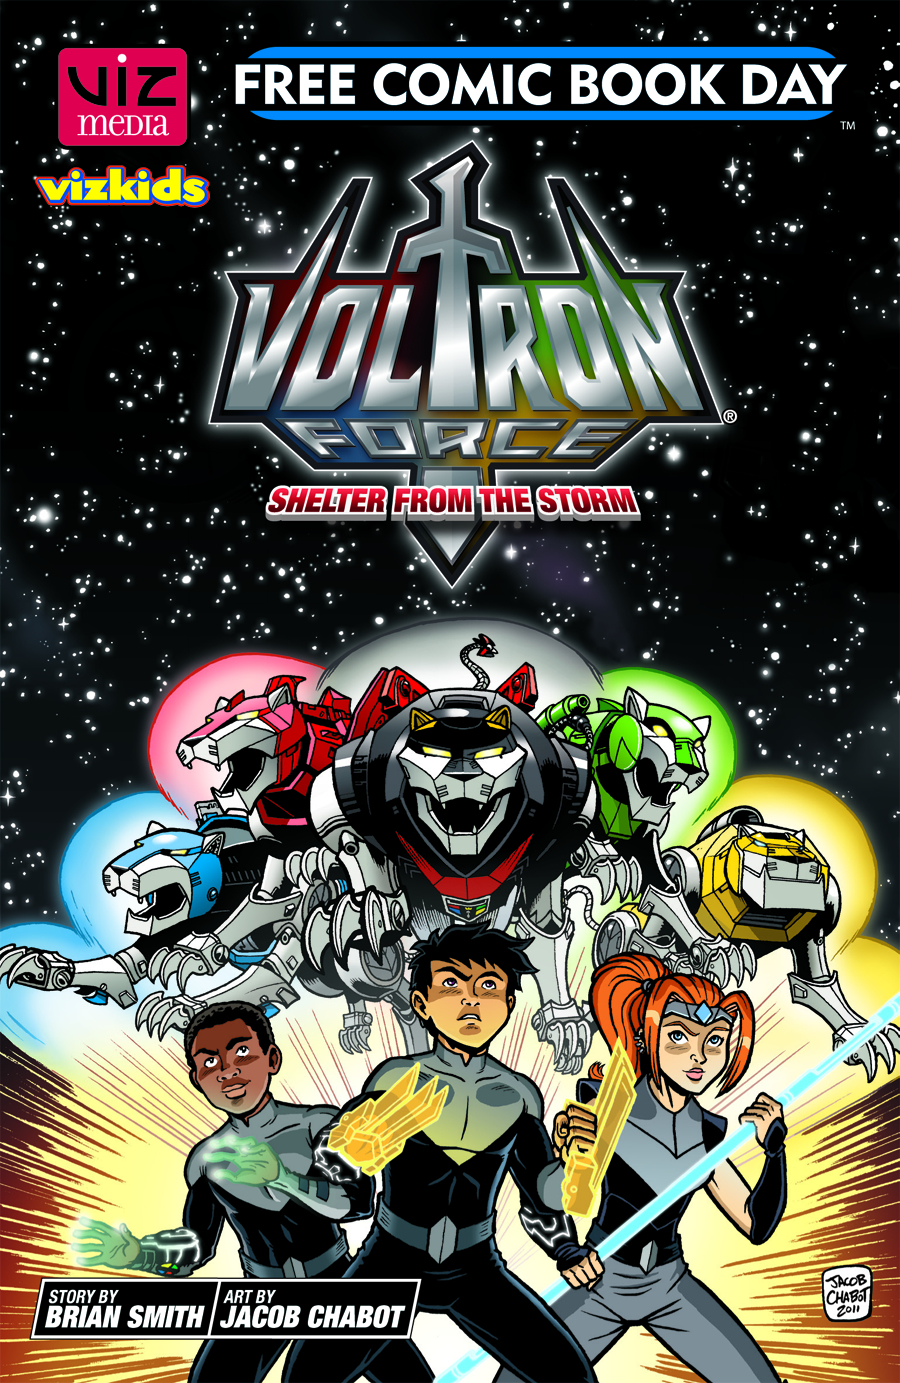 STK459915 Free Comic Book Day 2012: Reviews!